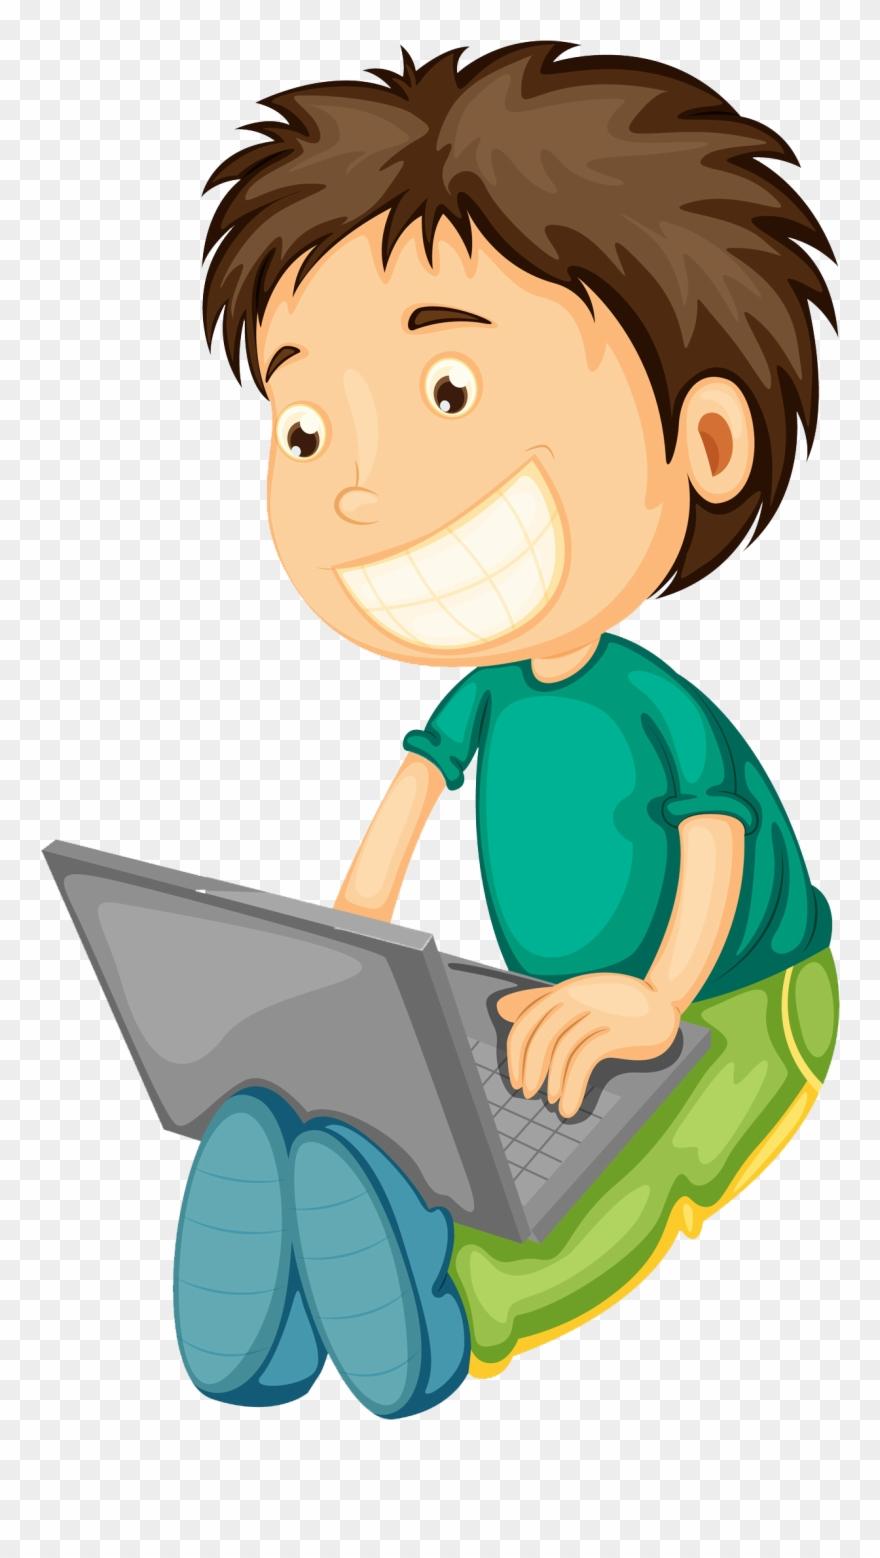 Computer Boy Clipart.